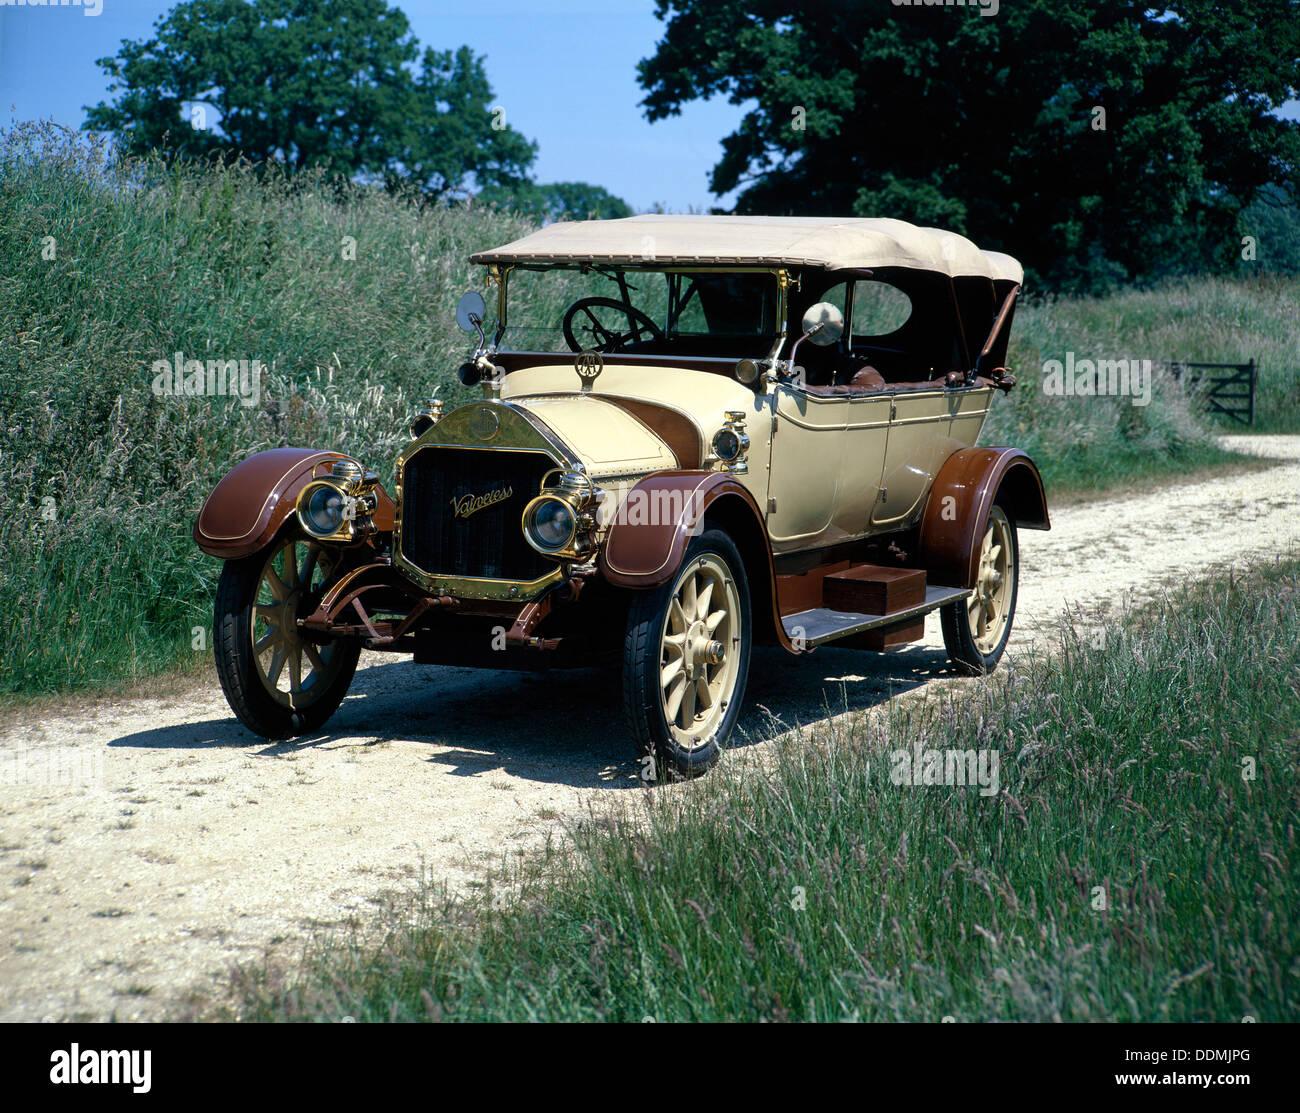 A 1914 Valveless 19.9hp. - Stock Image